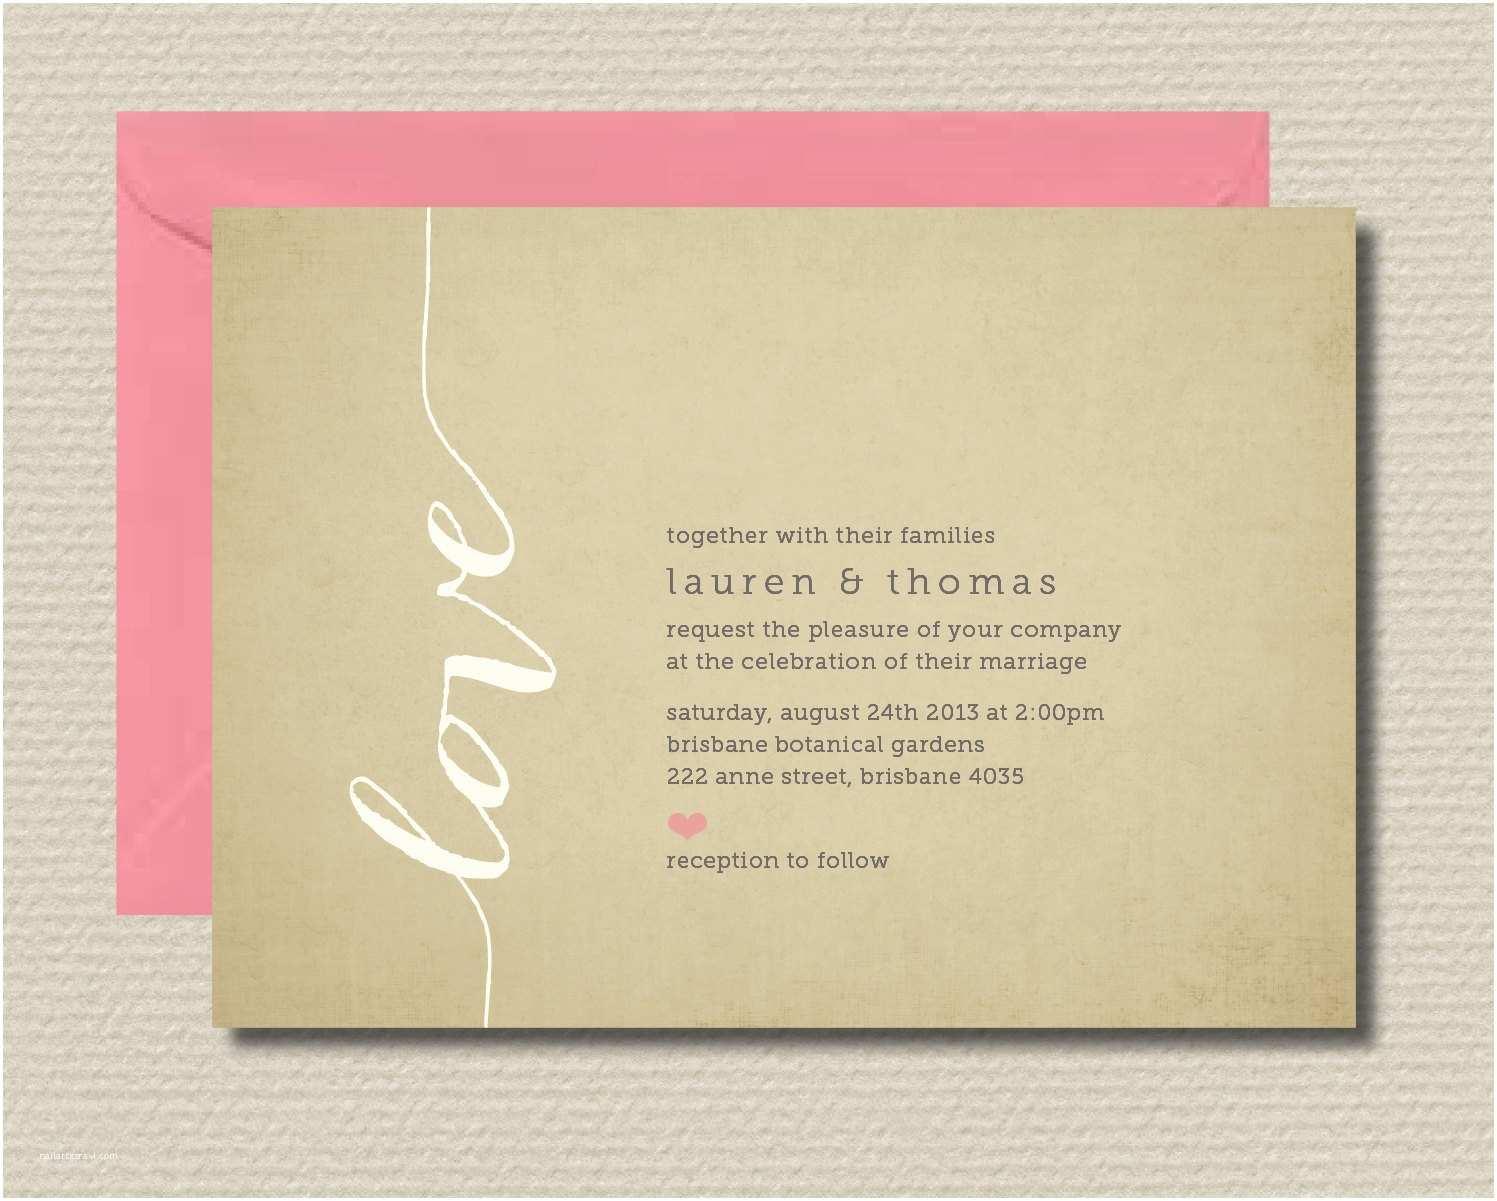 Wedding Invitation Rsvp Wording Samples Wedding Invitation Rsvp Wording